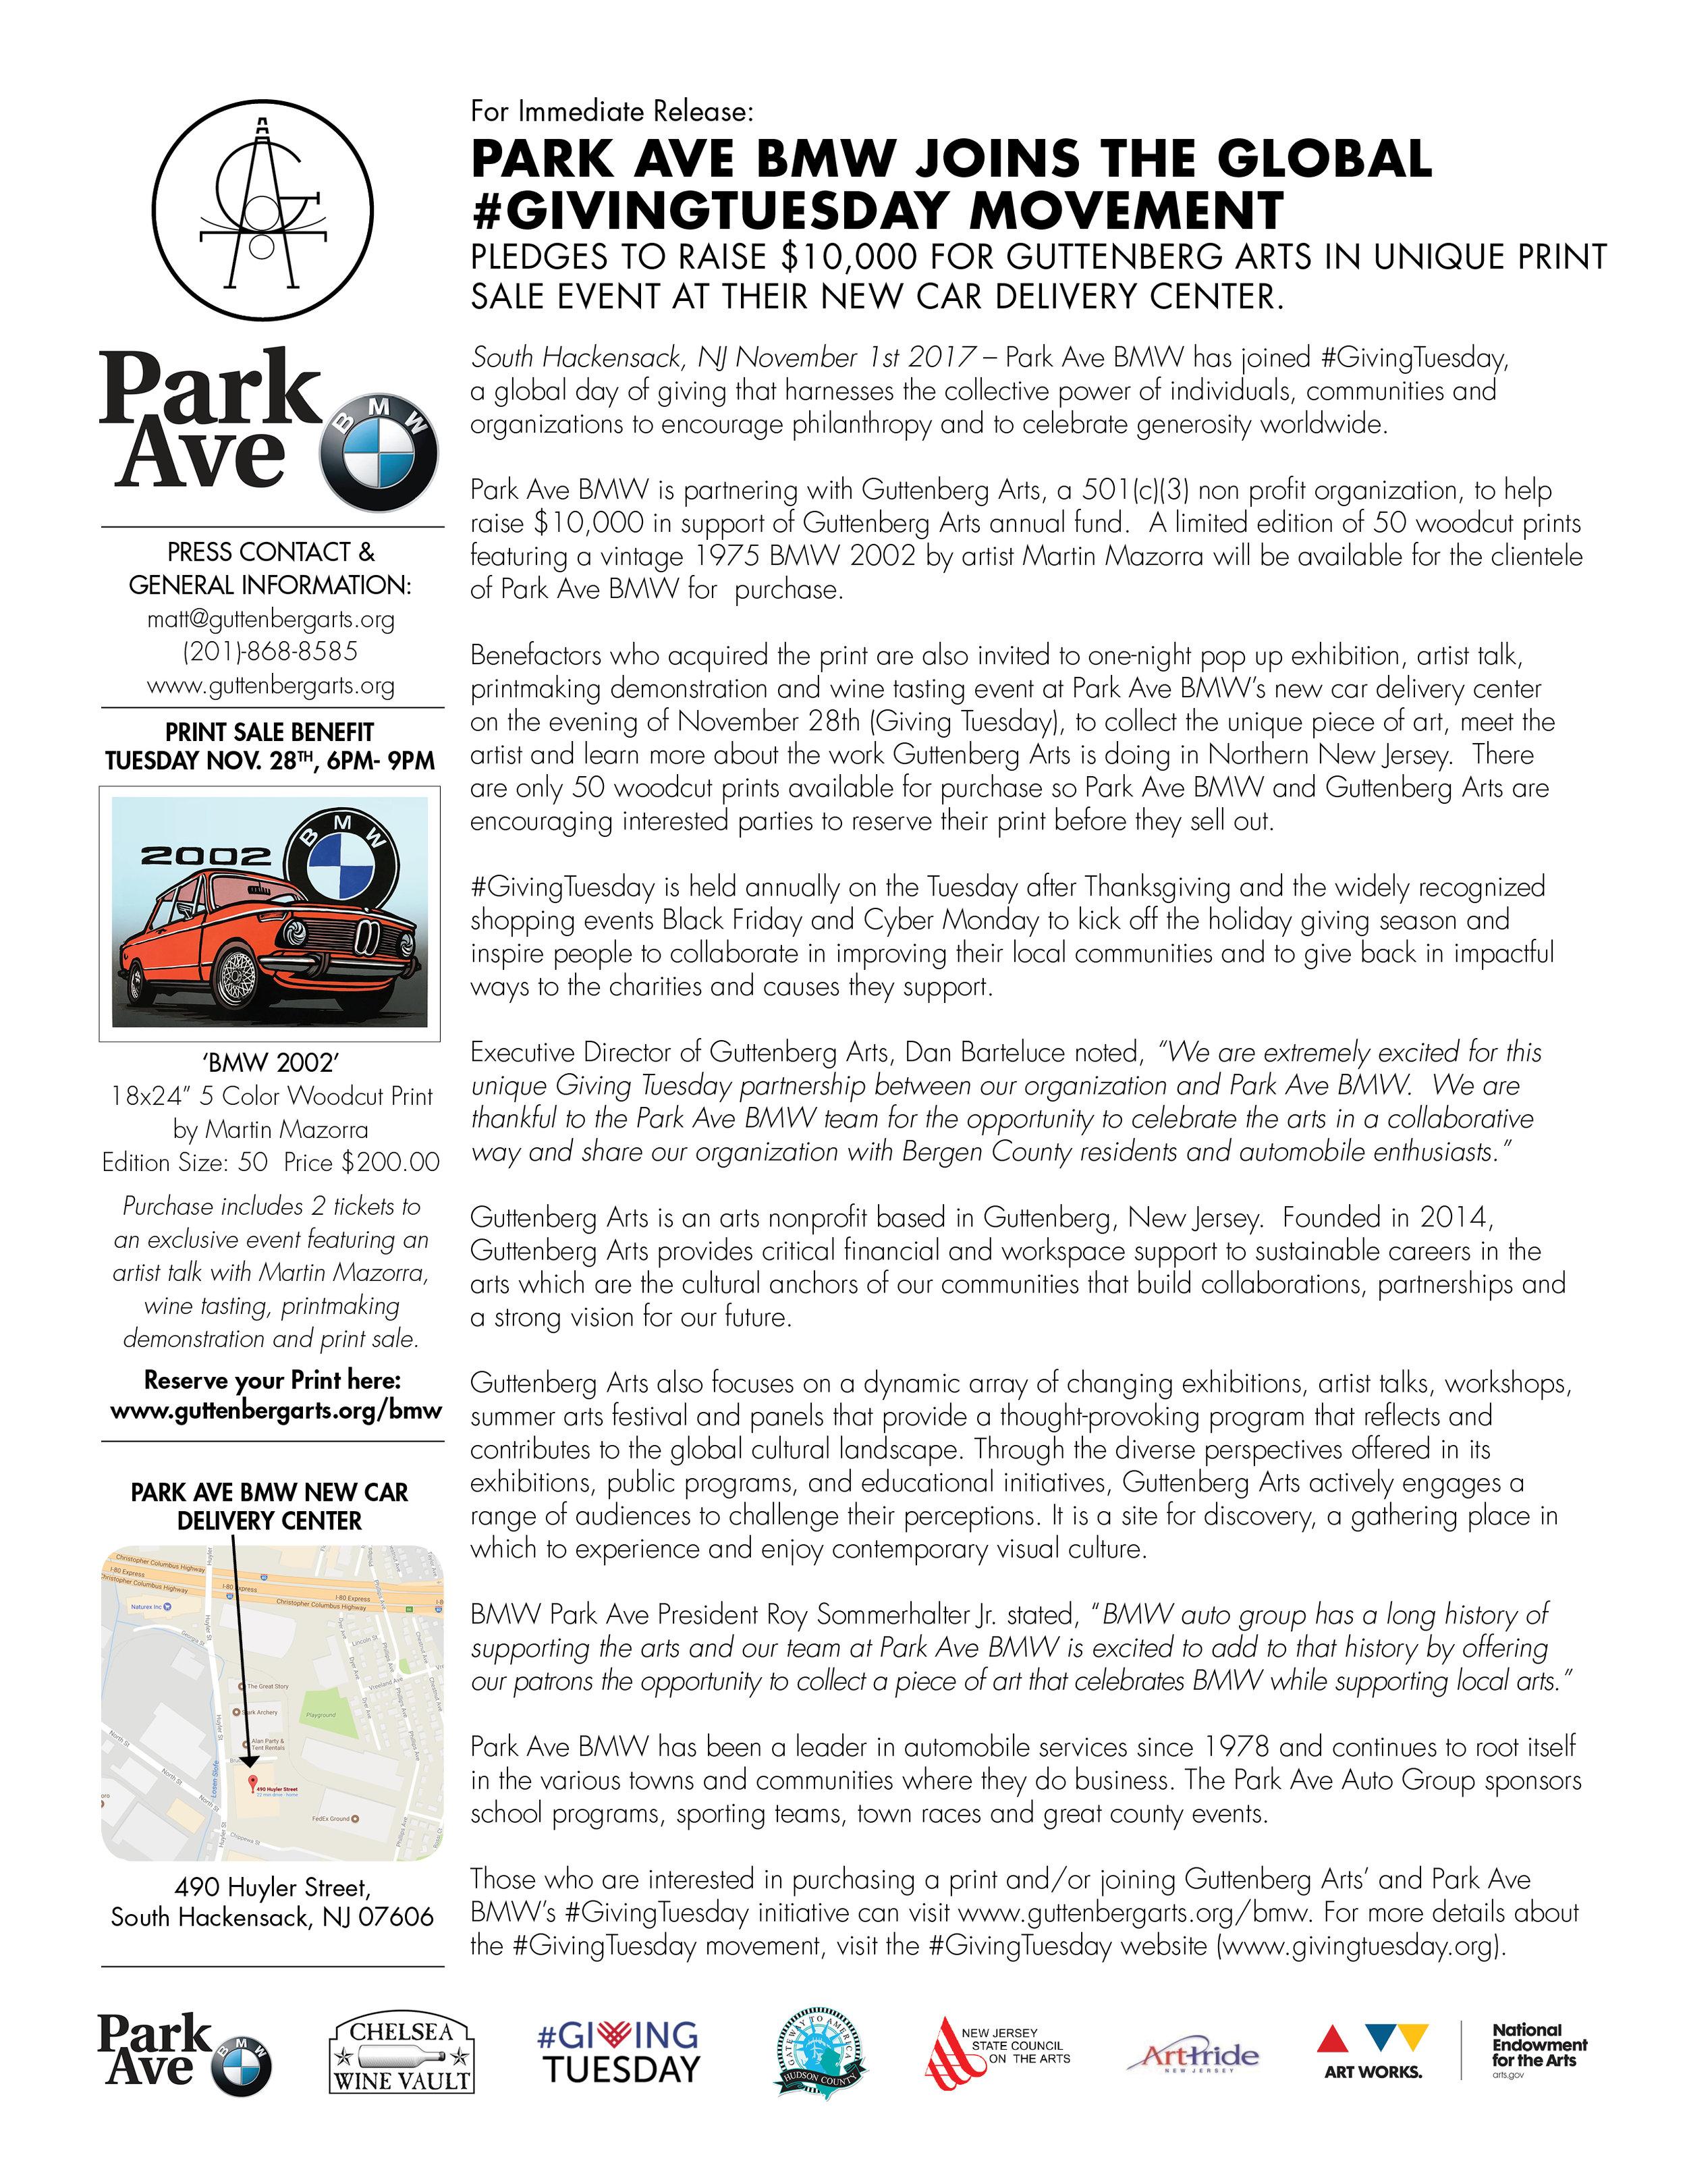 BMW Print Sale Benefit Press Release.jpg